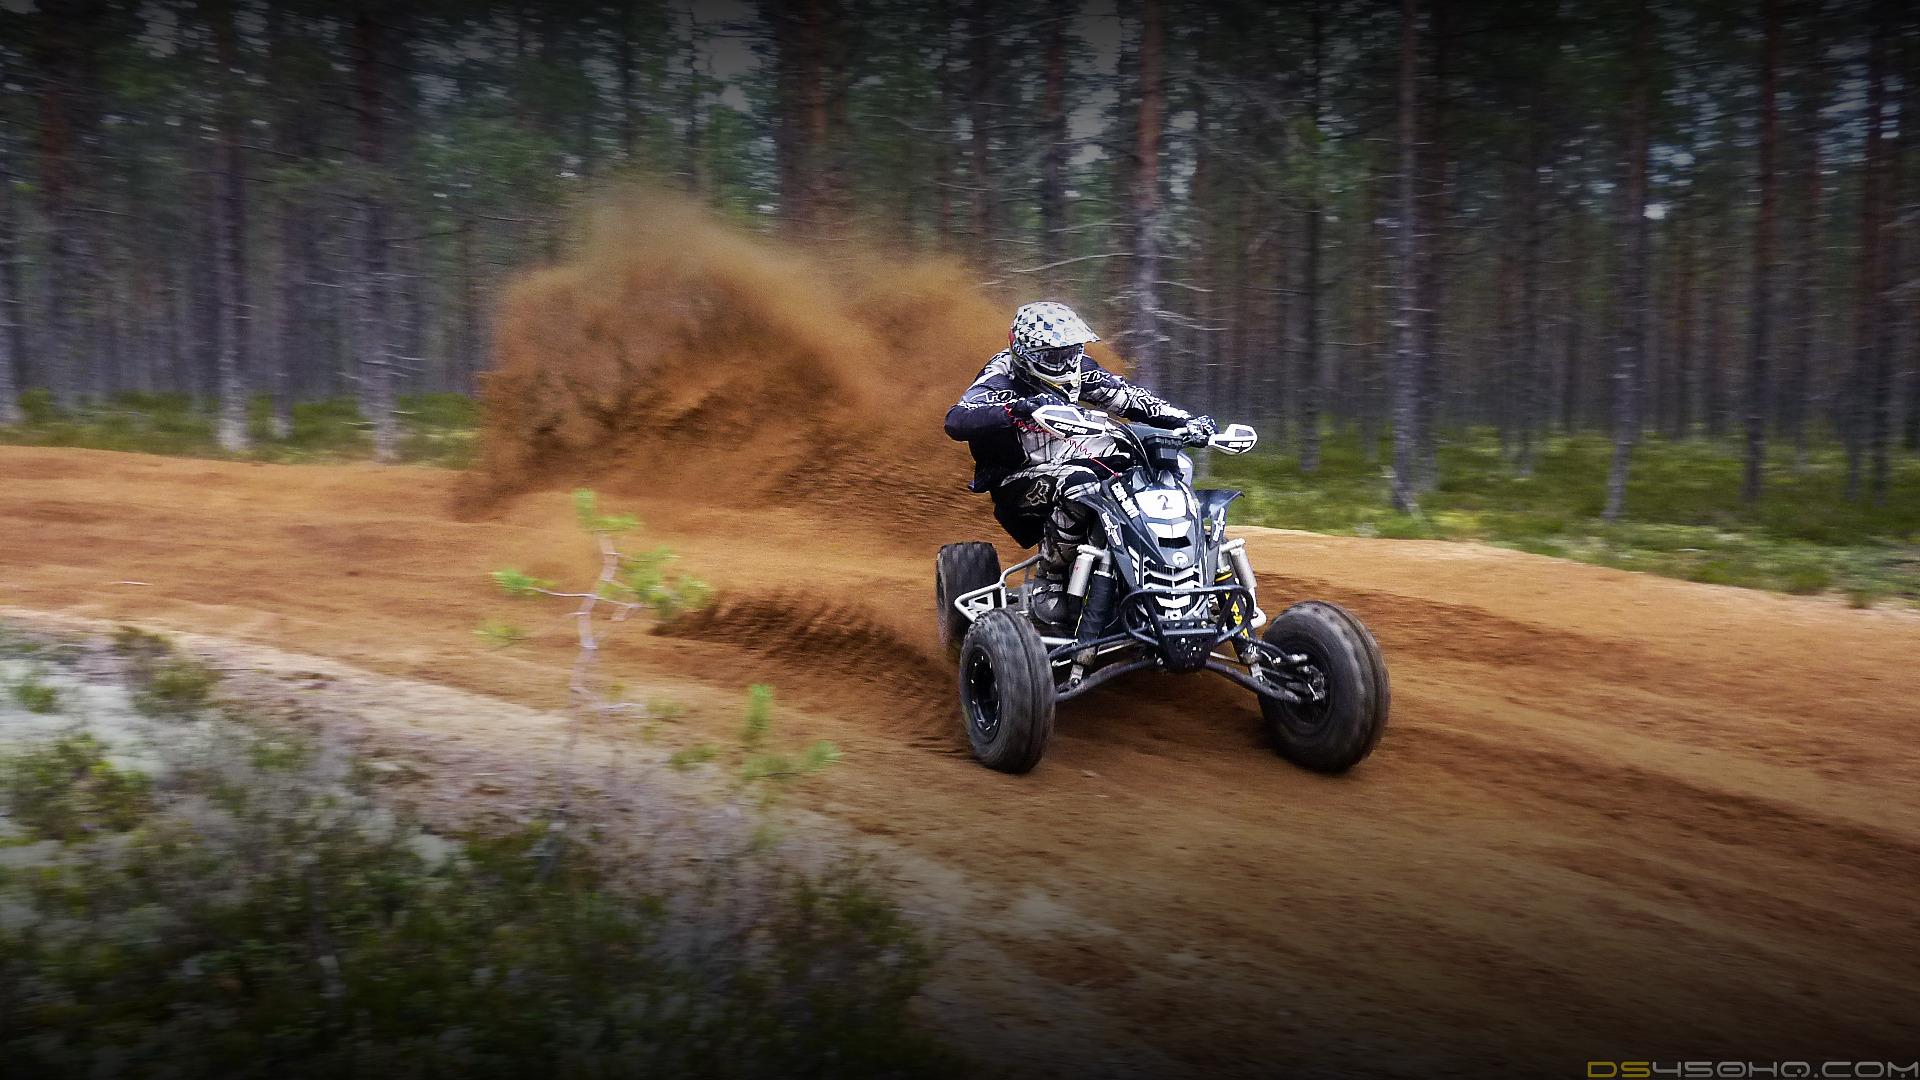 Motorcycle Racing On The Sand Suzuki Hd Desktop Mobile: WallpaperSafari